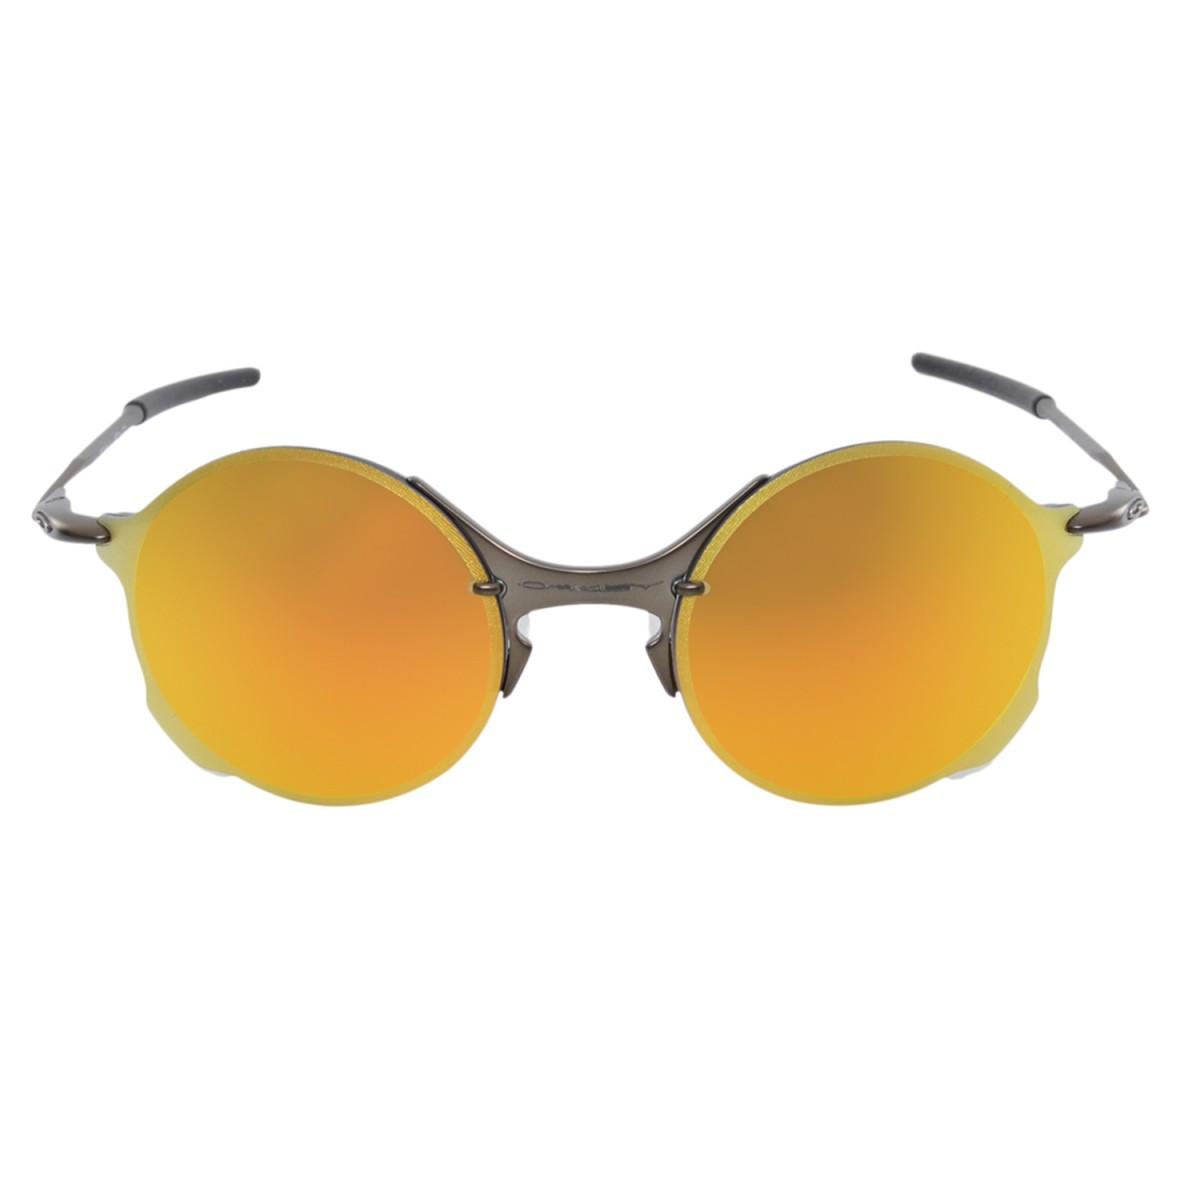 df29816819 Óculos Oakley Tailend Pewter Polarizado - Laranja e Amarelo